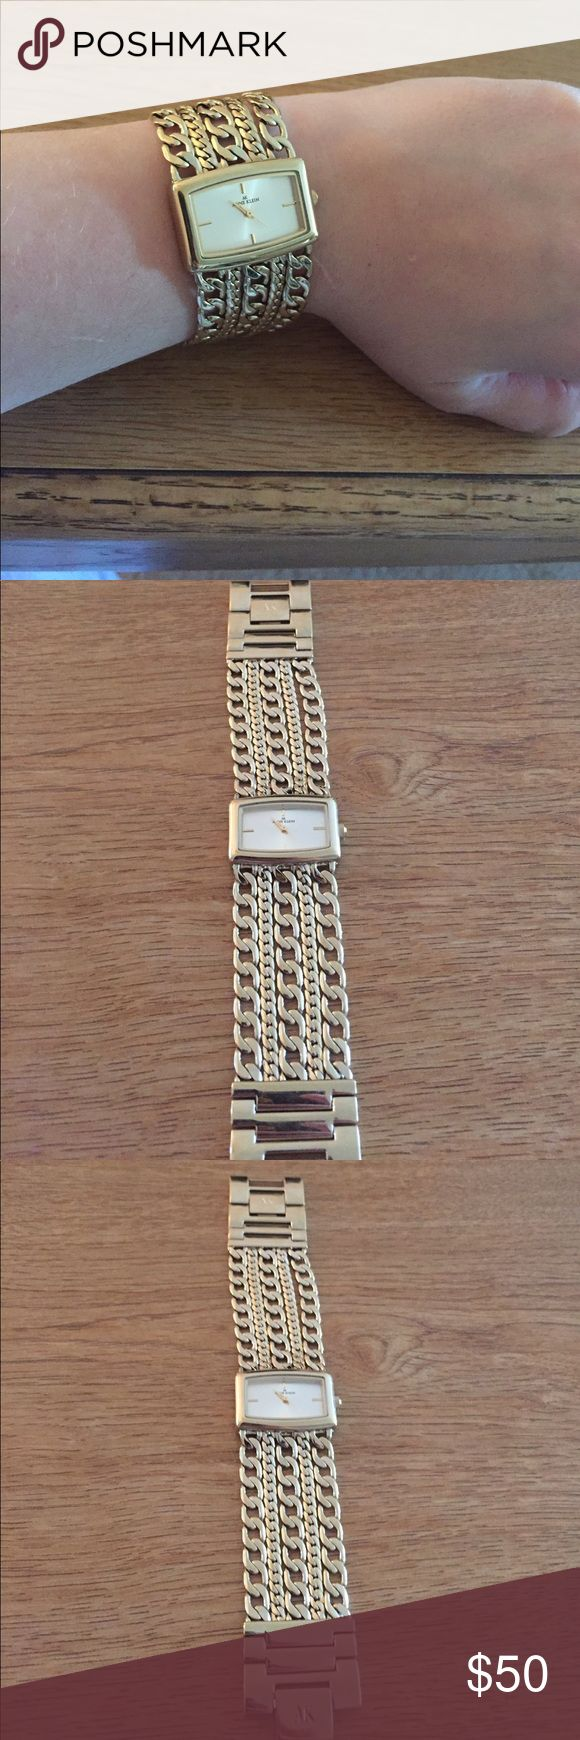 Anne Klein Gold Wrist Watch Gold braided band. No scratches or wear marks. Rectangular face with second hand. Anne Klein Accessories Watches